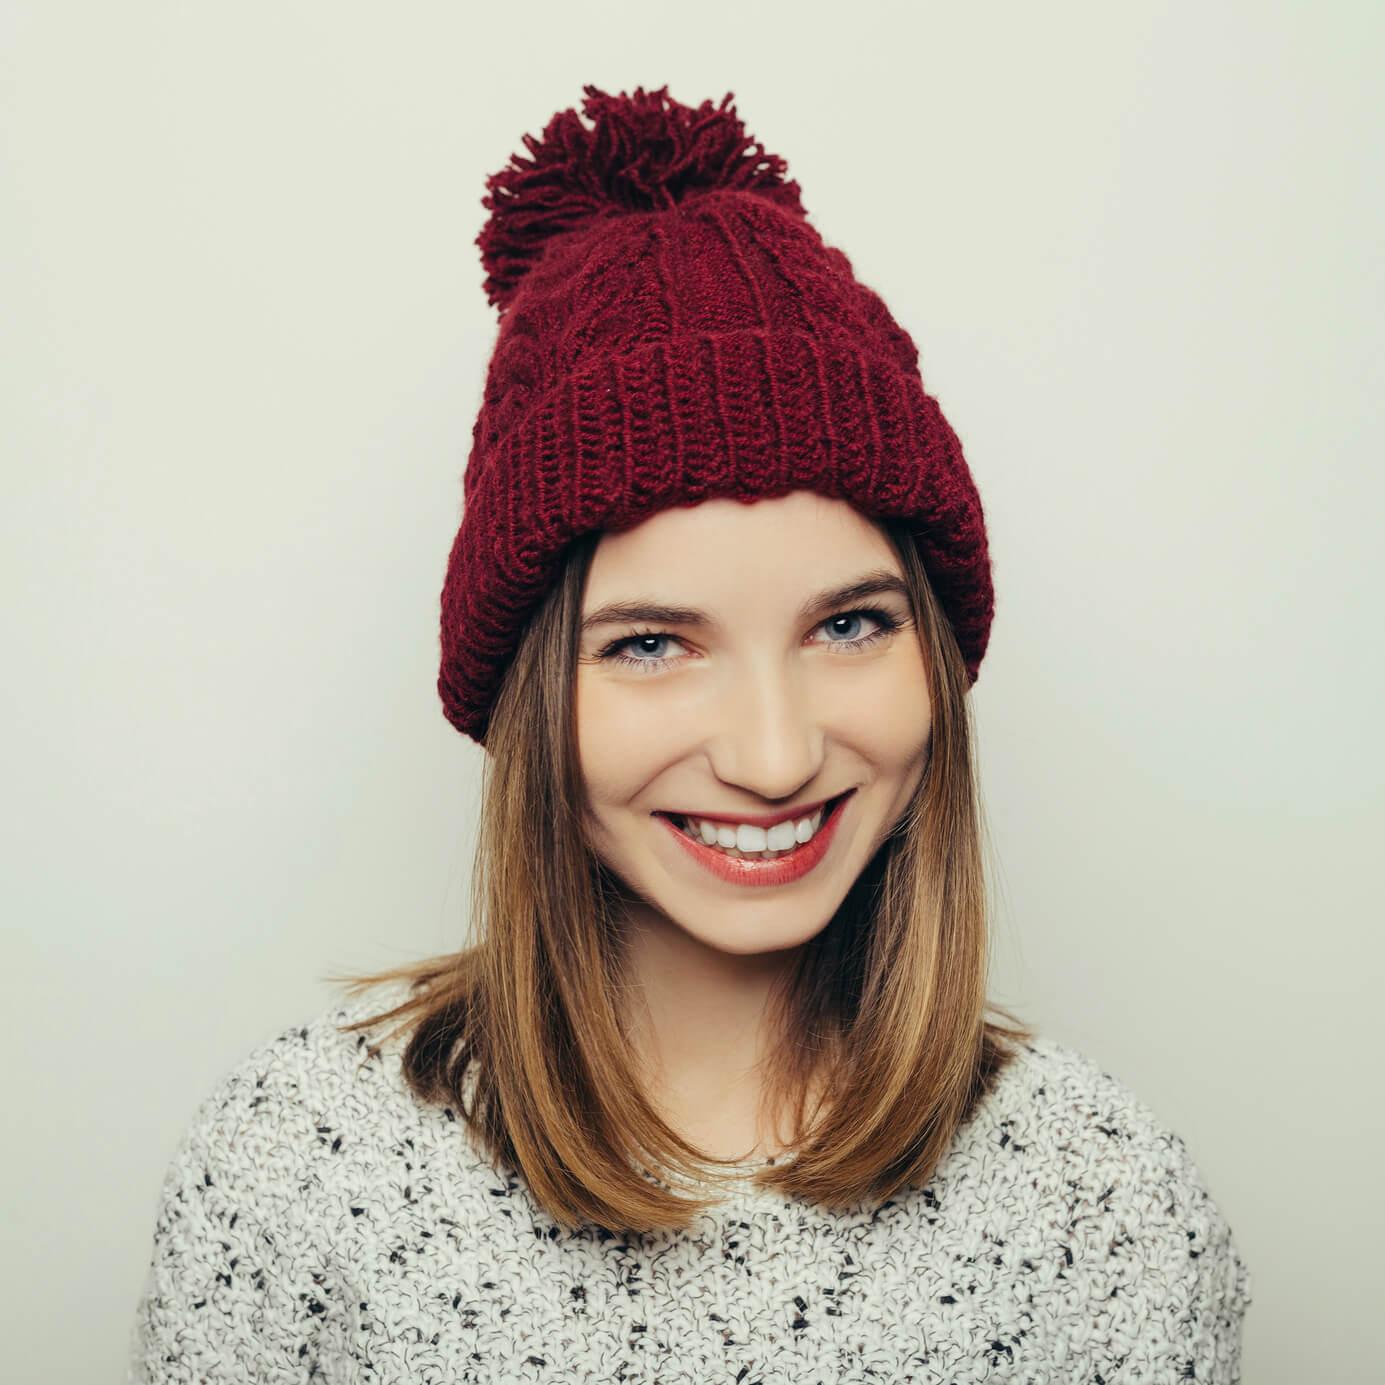 young woman wearing winter hair